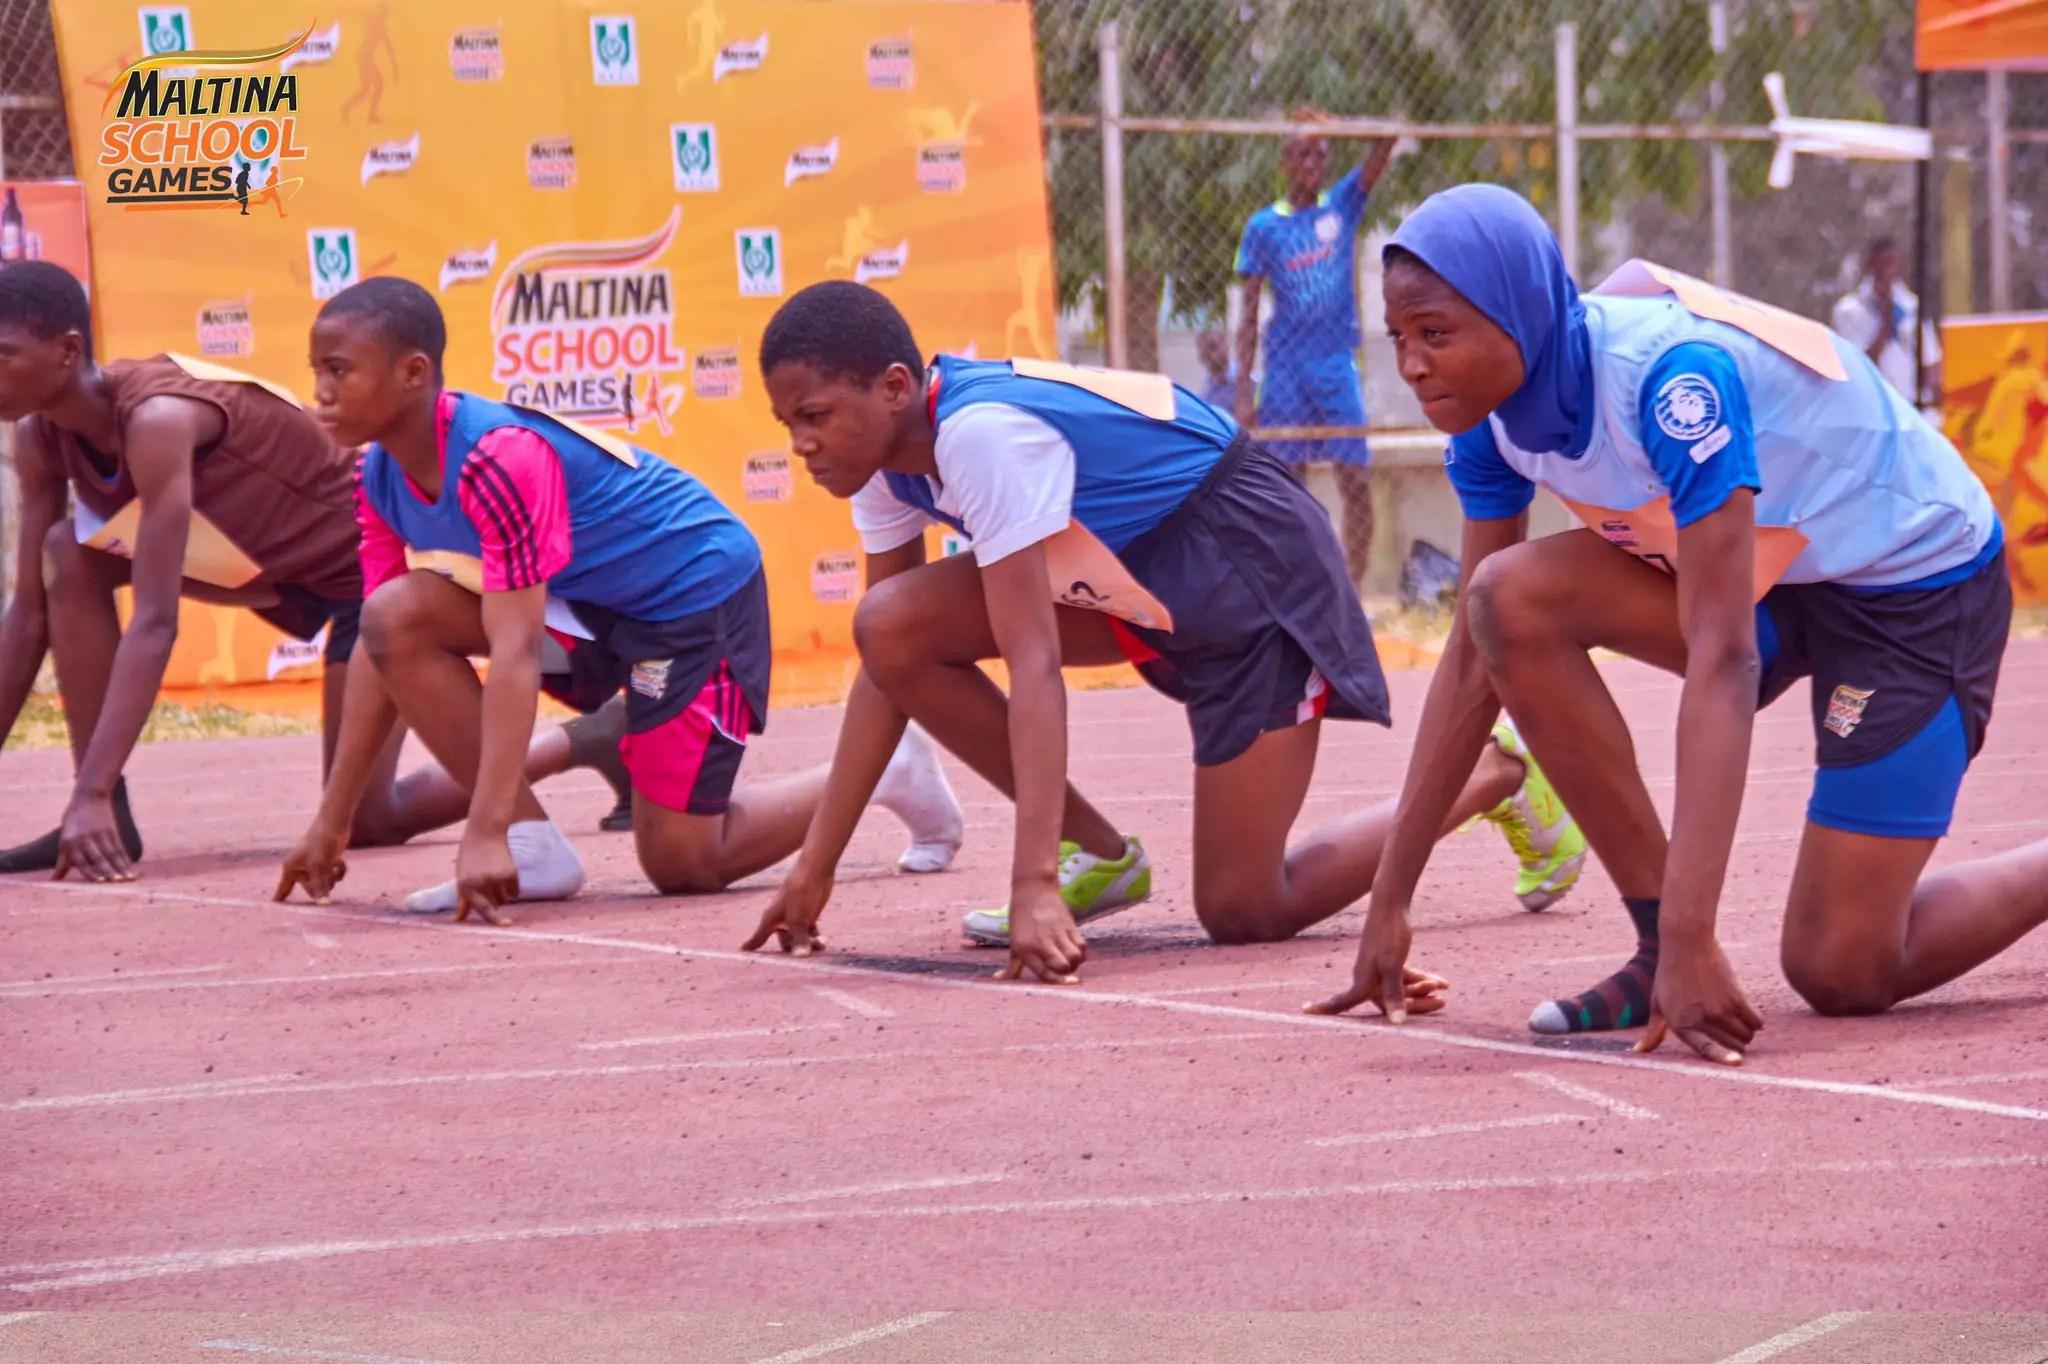 Lagos Agog For Maltina School Games National Finals